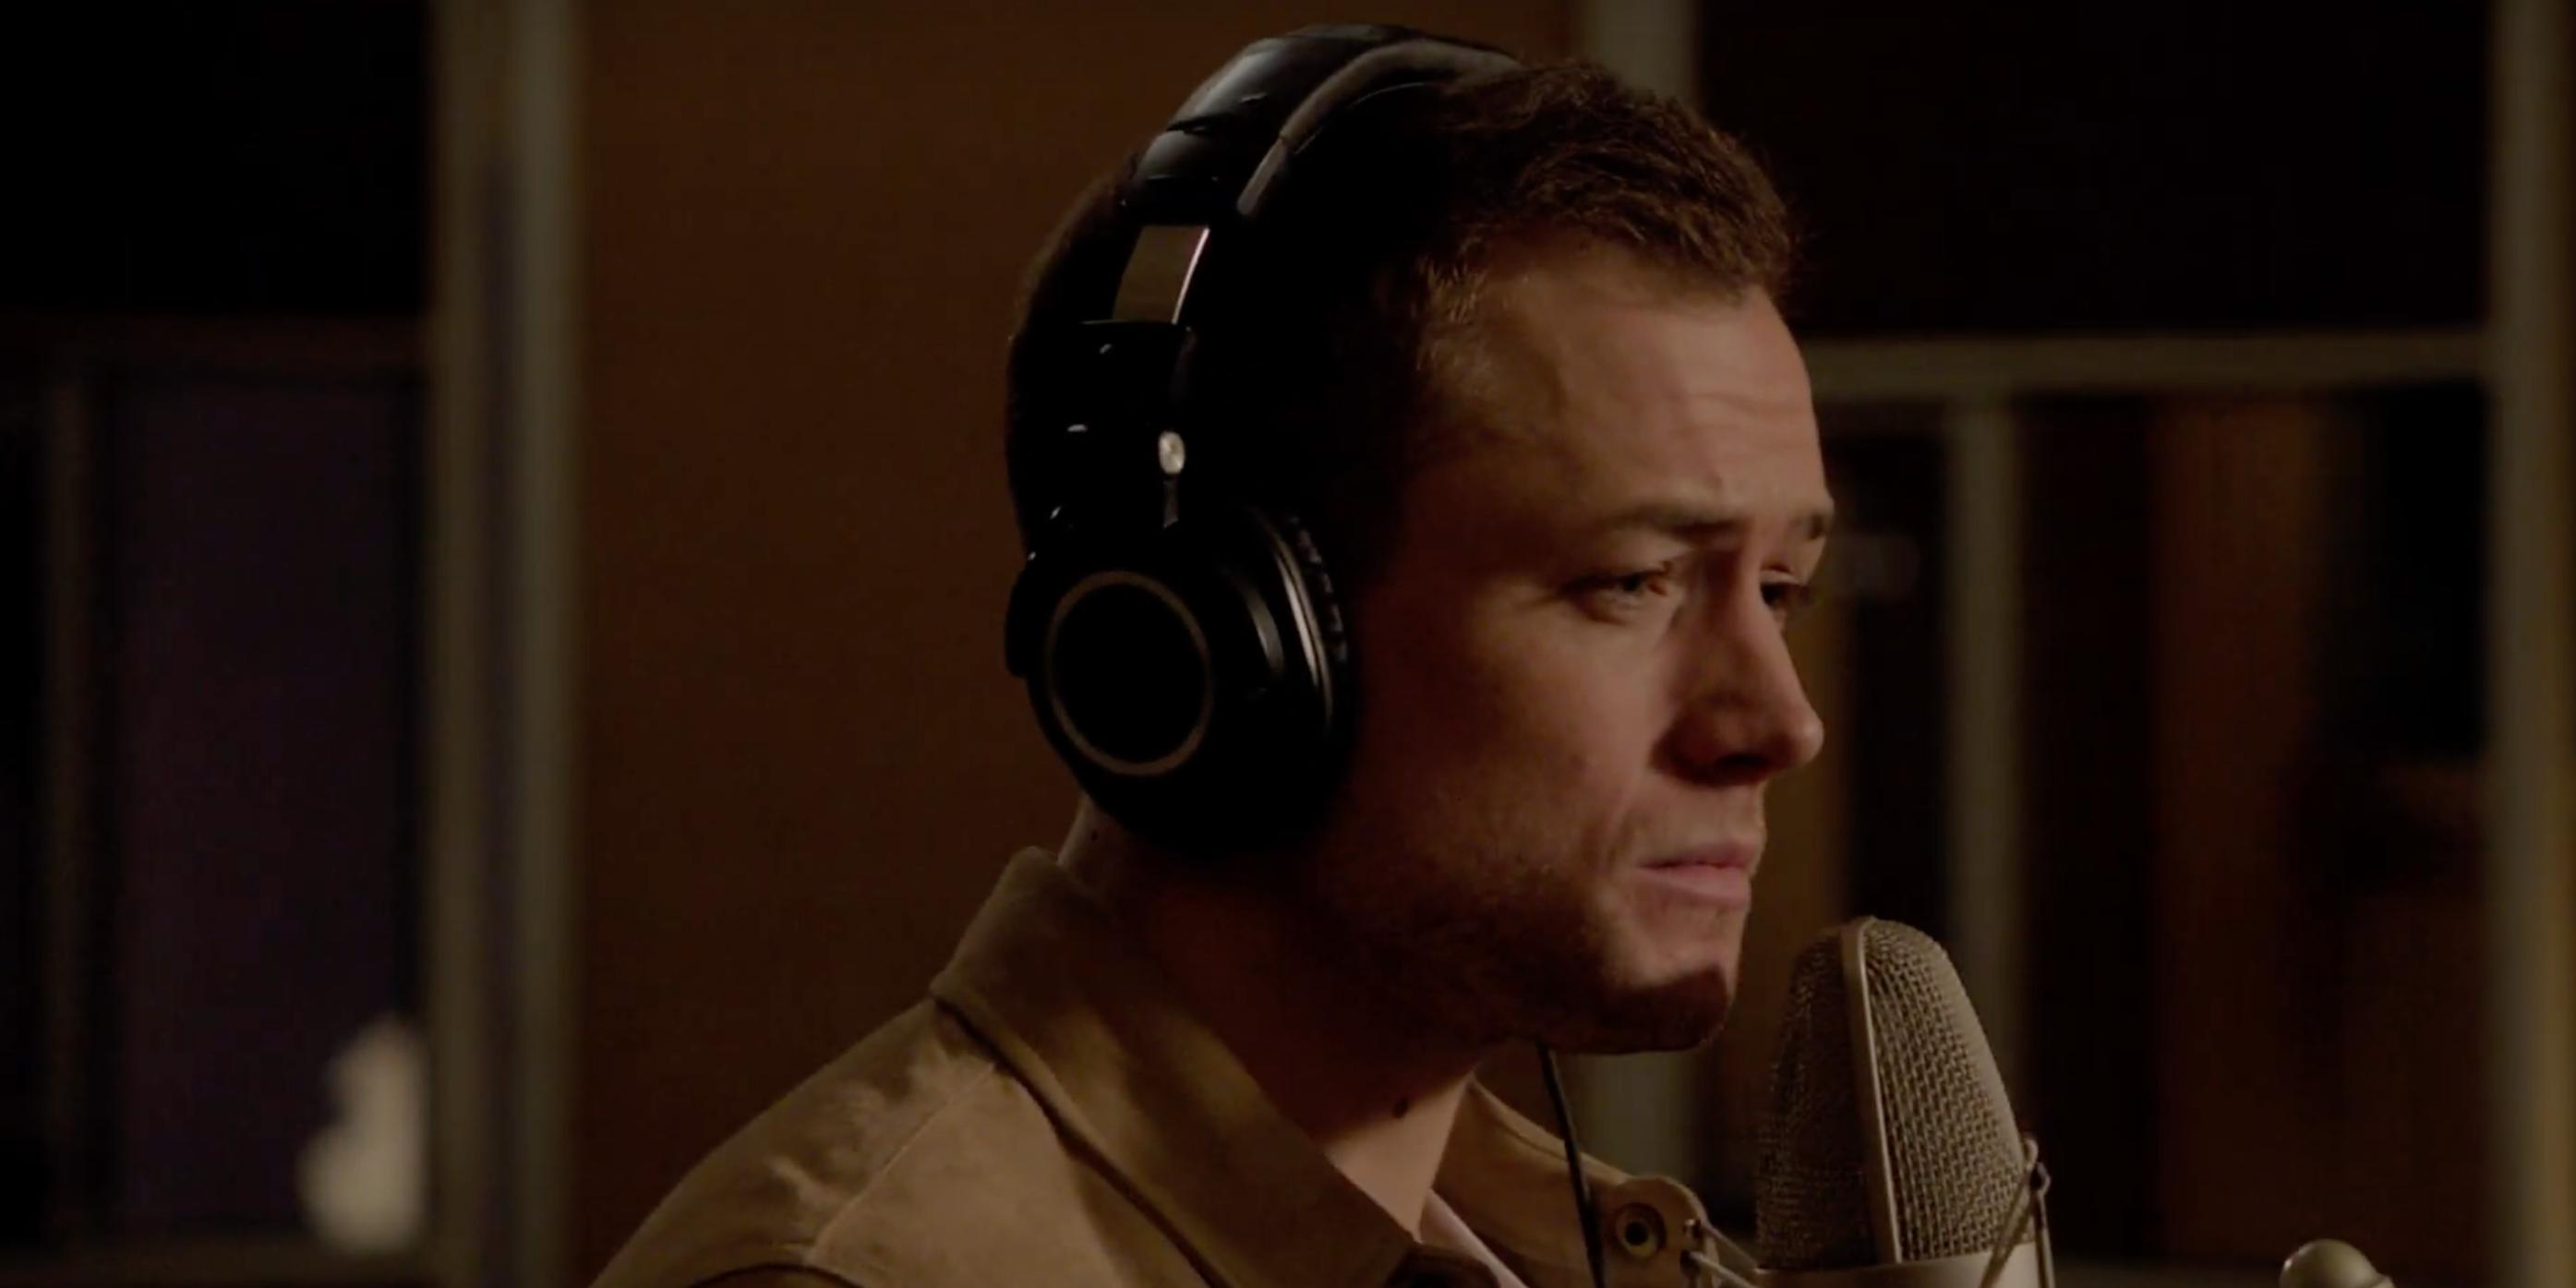 Taron Egerton nails Elton John's 'Rocket Man' for biopic soundtrack – watch